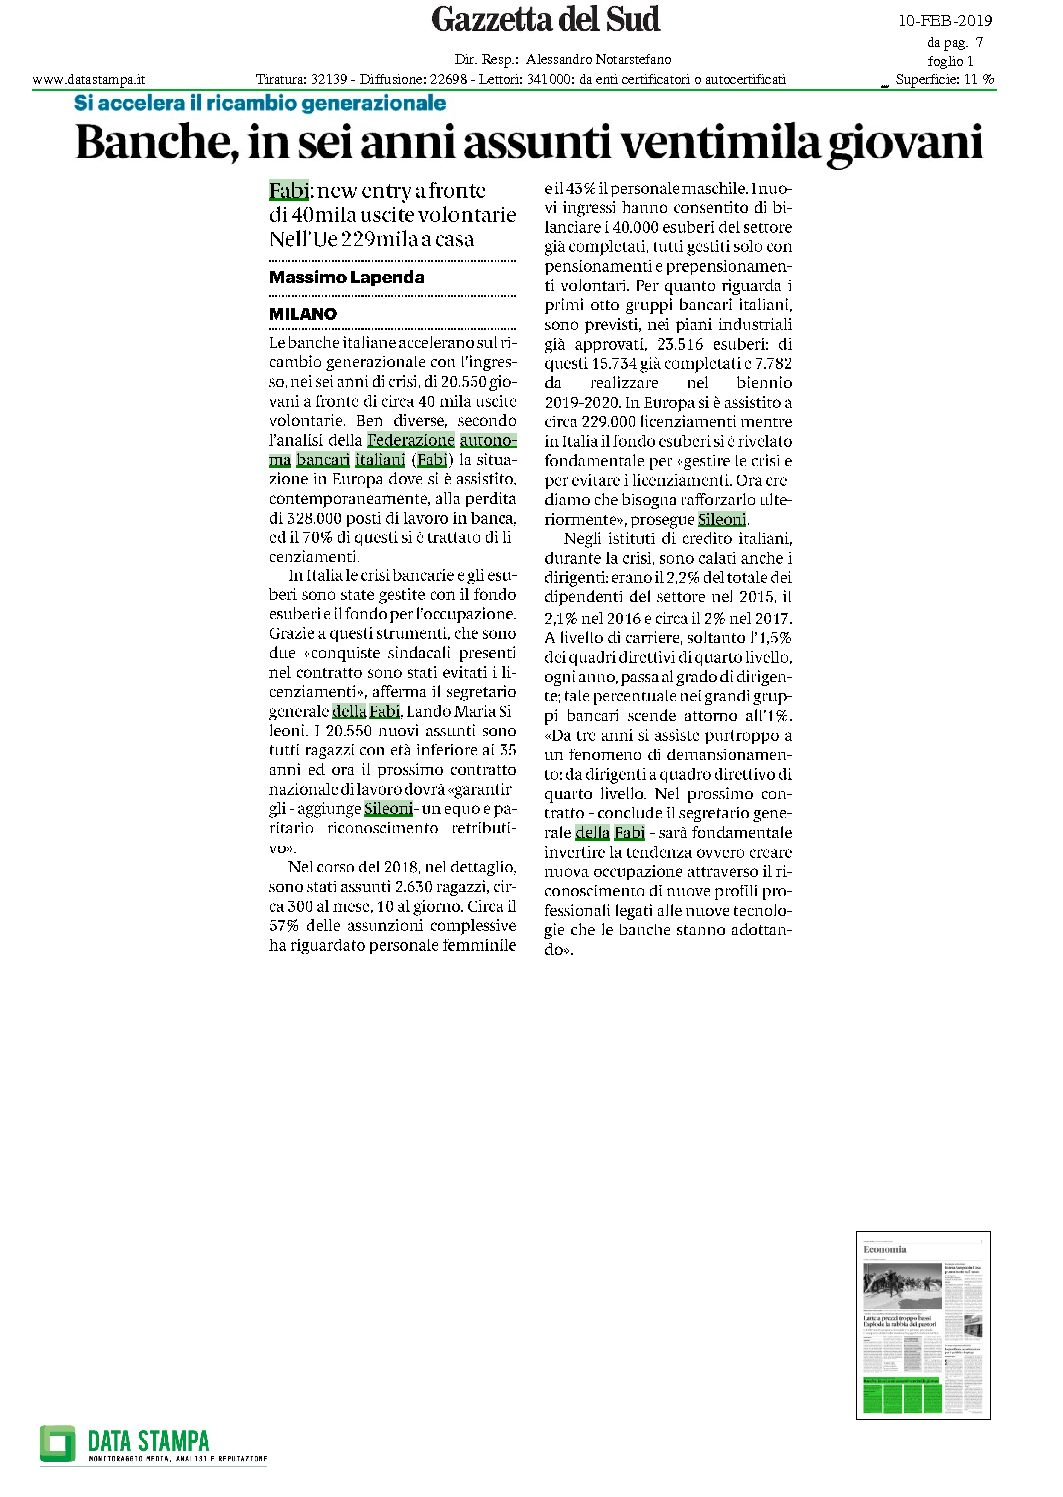 GAZZETTADELSUD_100219_PDF